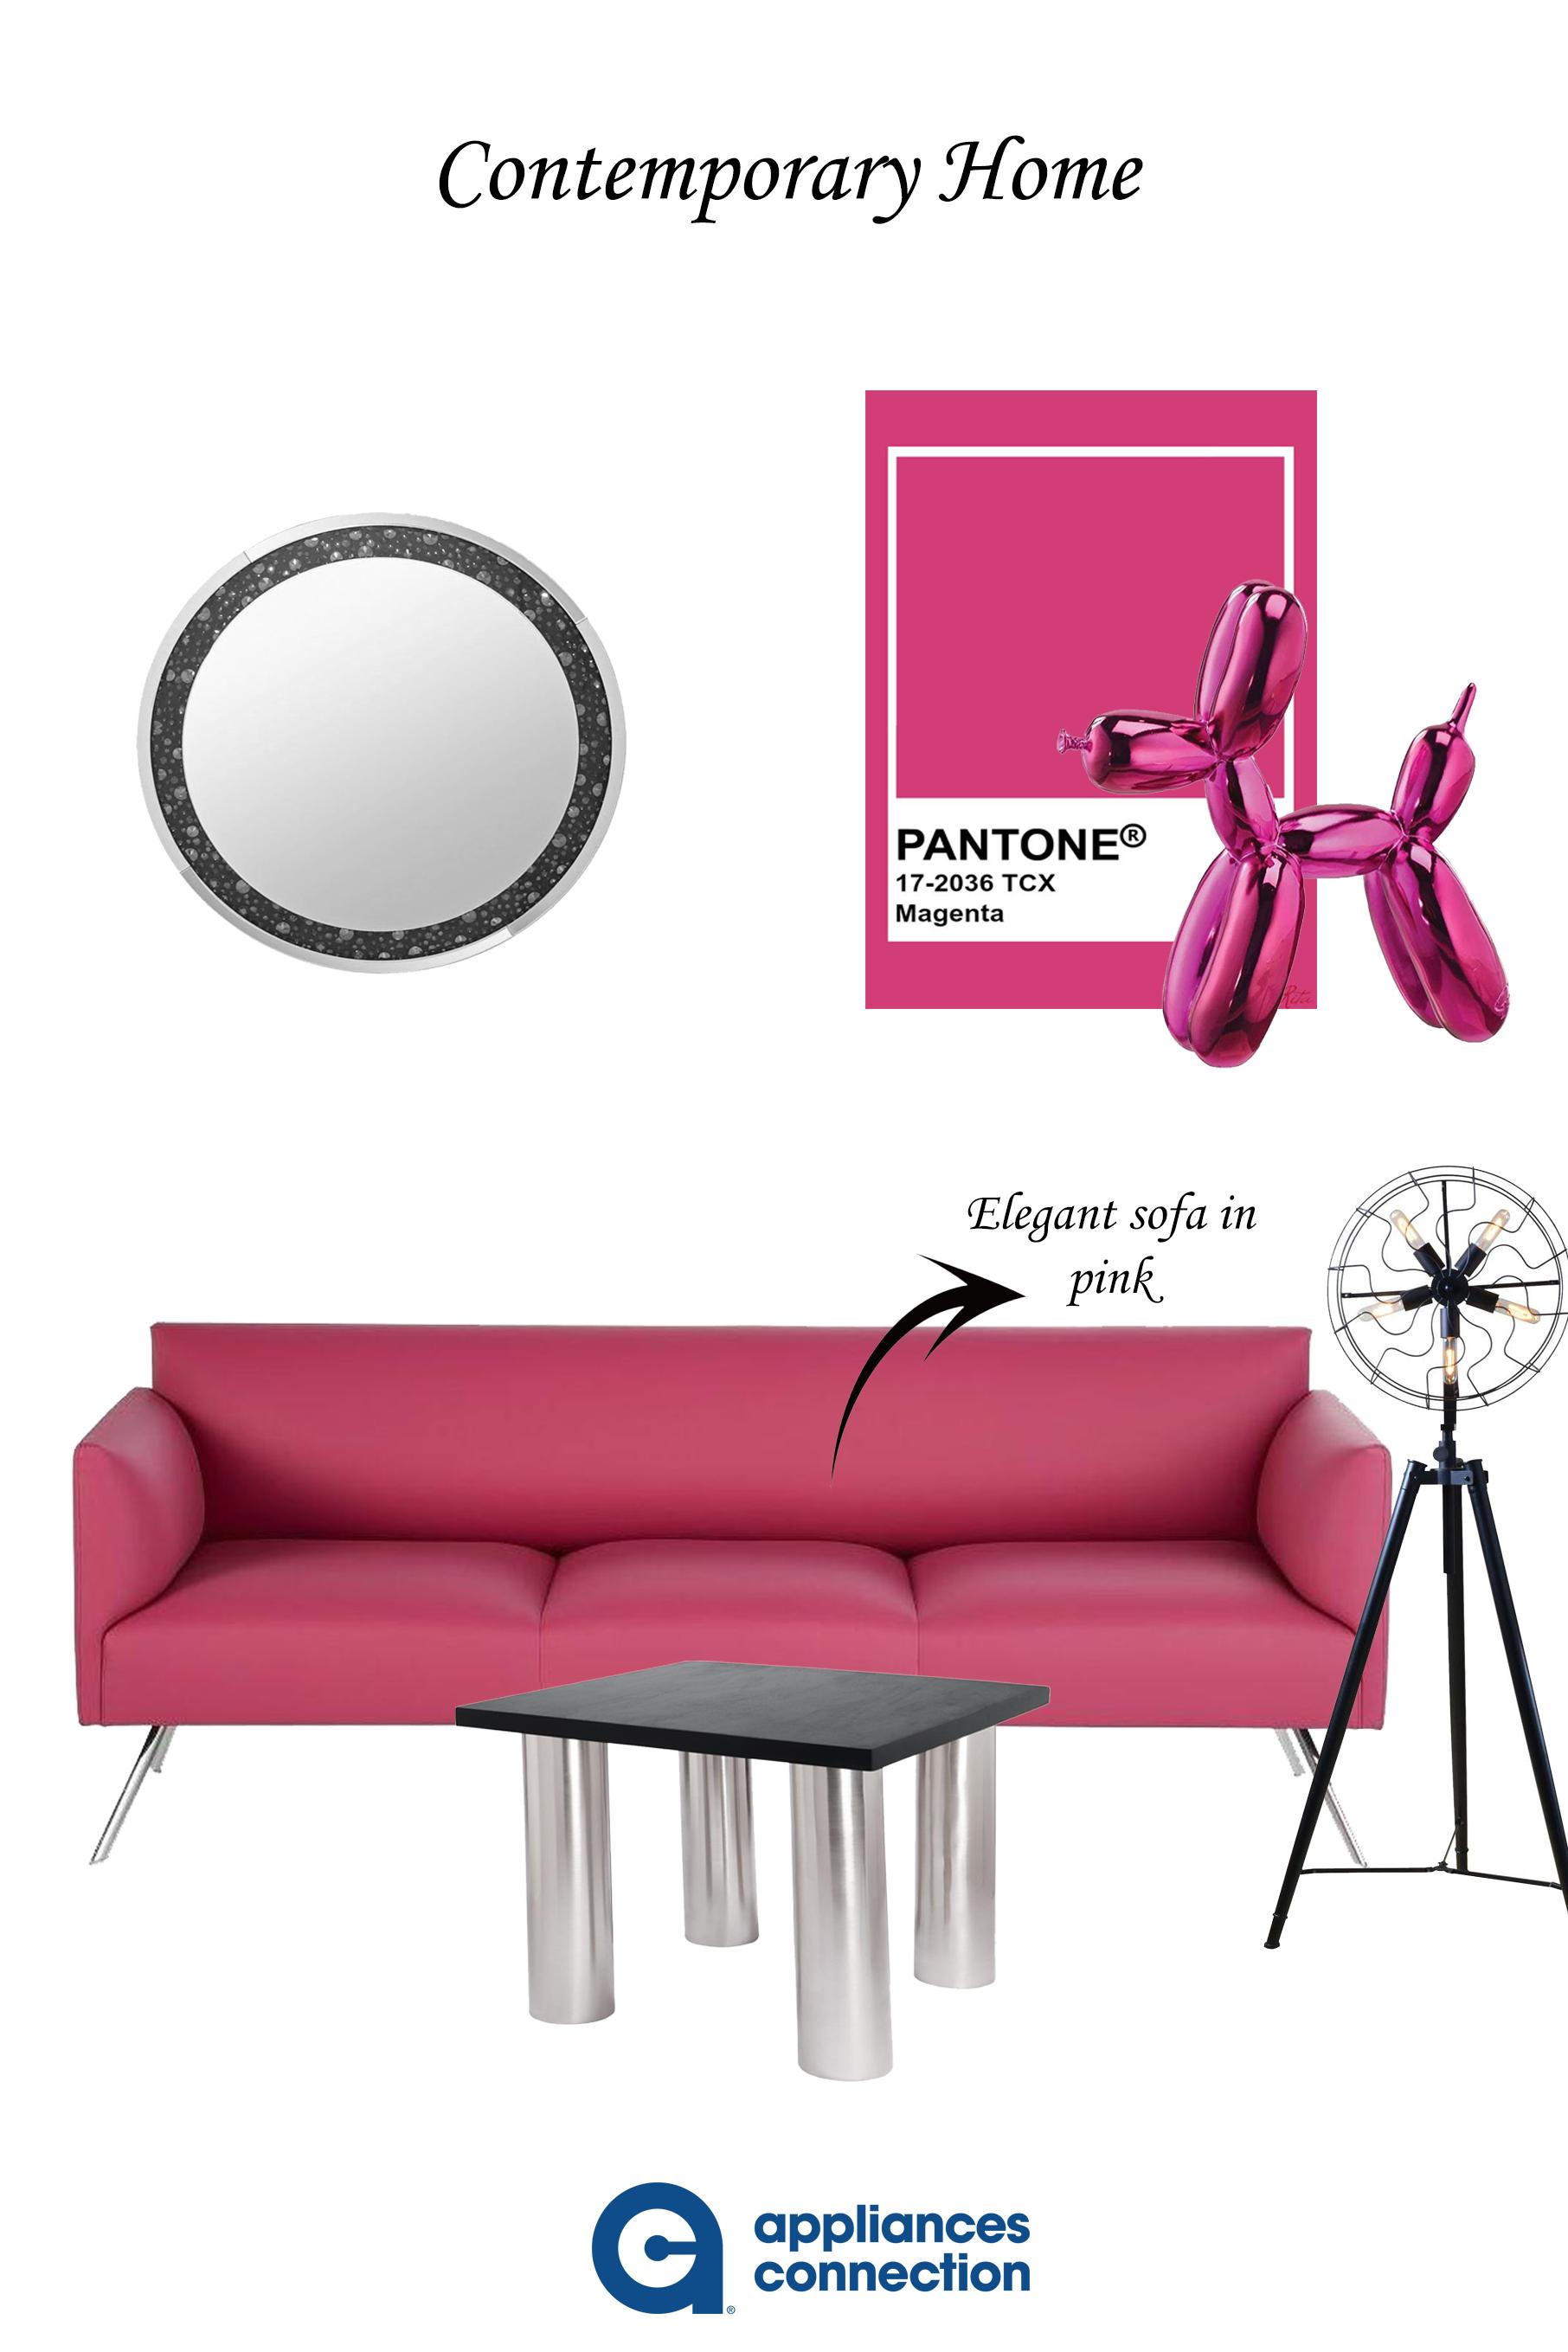 #modernhome #cozyhome #modernhomeideas #walldecor #lightings  #livingroom #livingroomideas #homedecor #homedecorideas #homedesign #homeideas #decorideas #walldecor #furnitureideas #furnituredesign